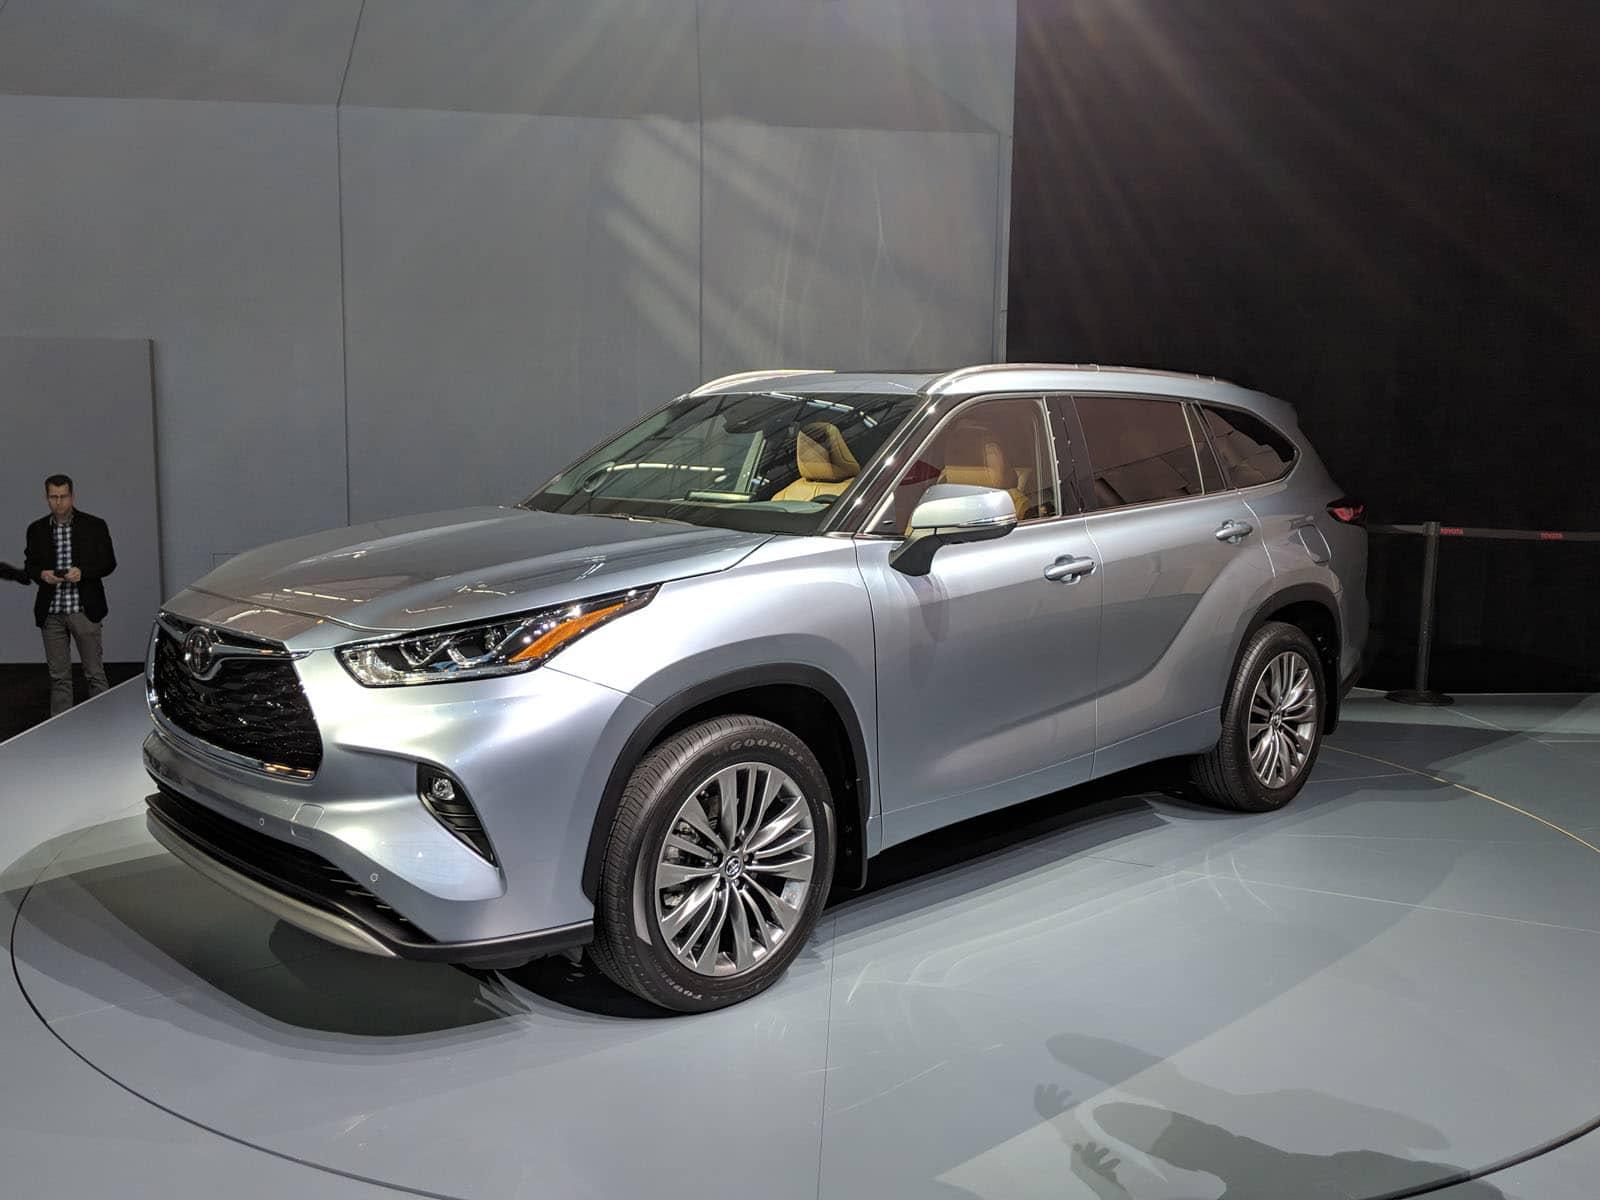 How To Make An Electric Motor >> 2020 Toyota Highlander, 2020 Subaru Outback, 2020 Mercedes ...